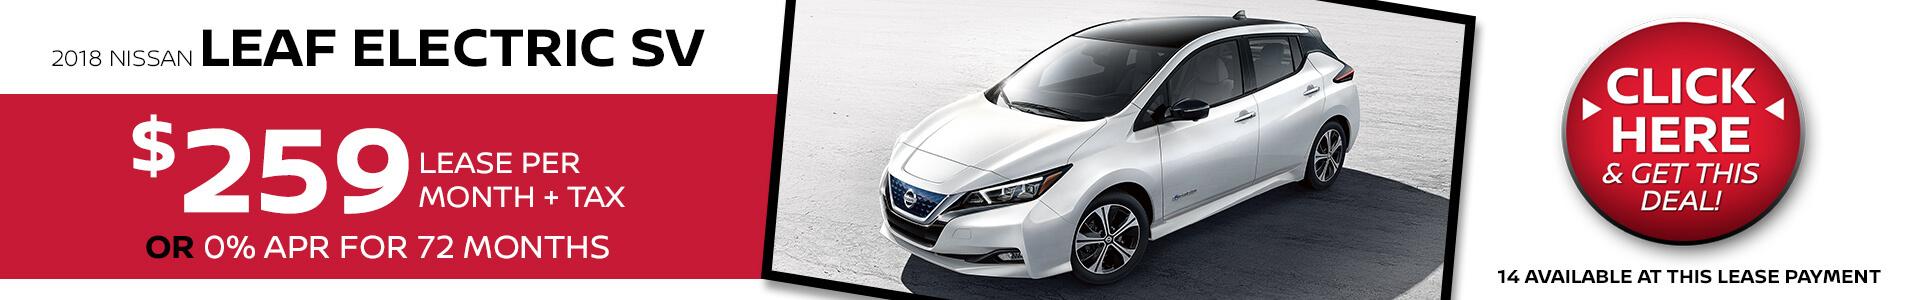 Nissan LEAF $259 Lease